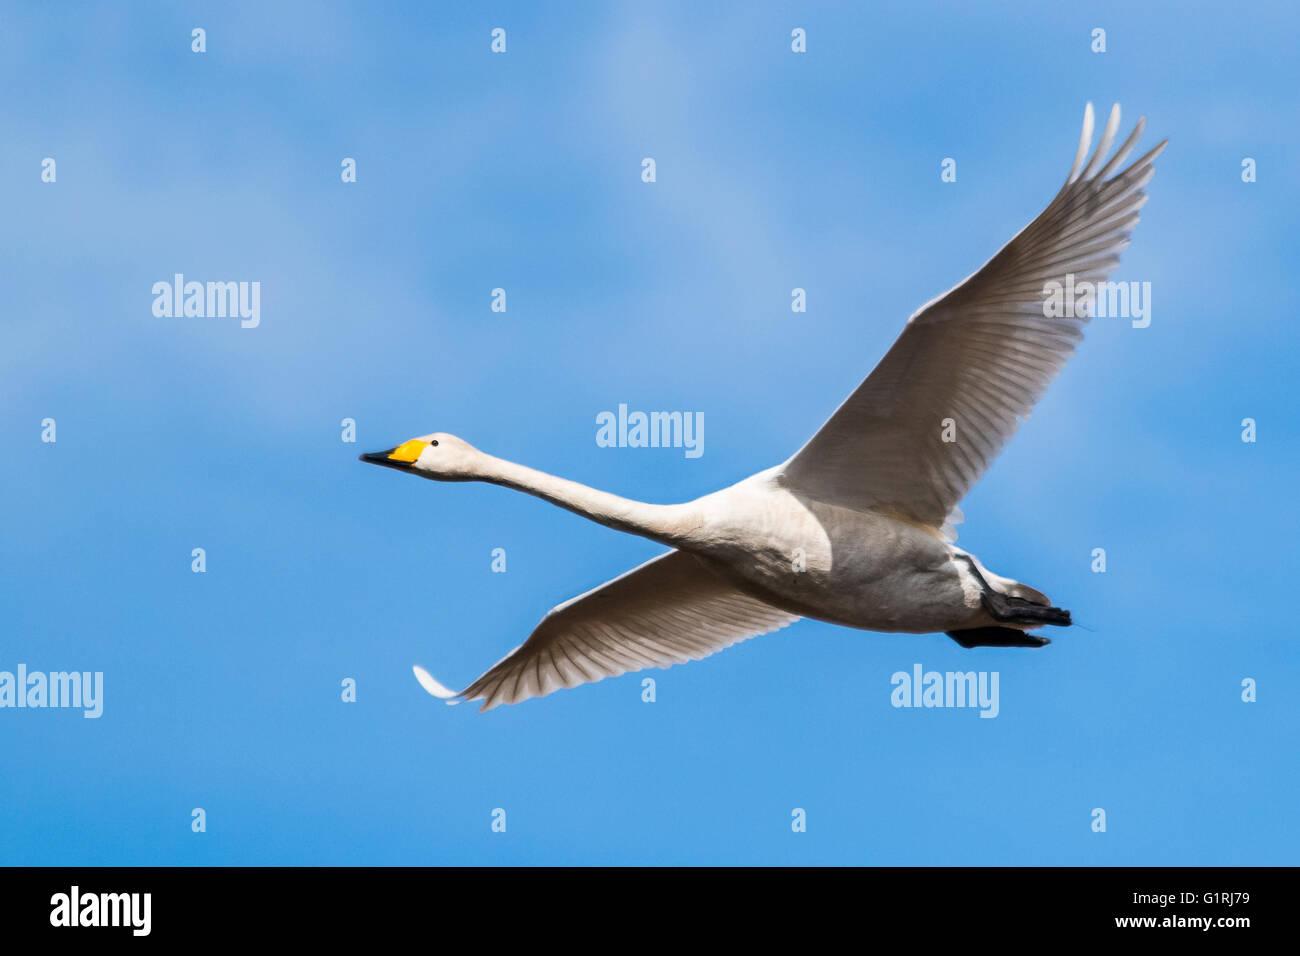 Whooper swan in flight - Stock Image